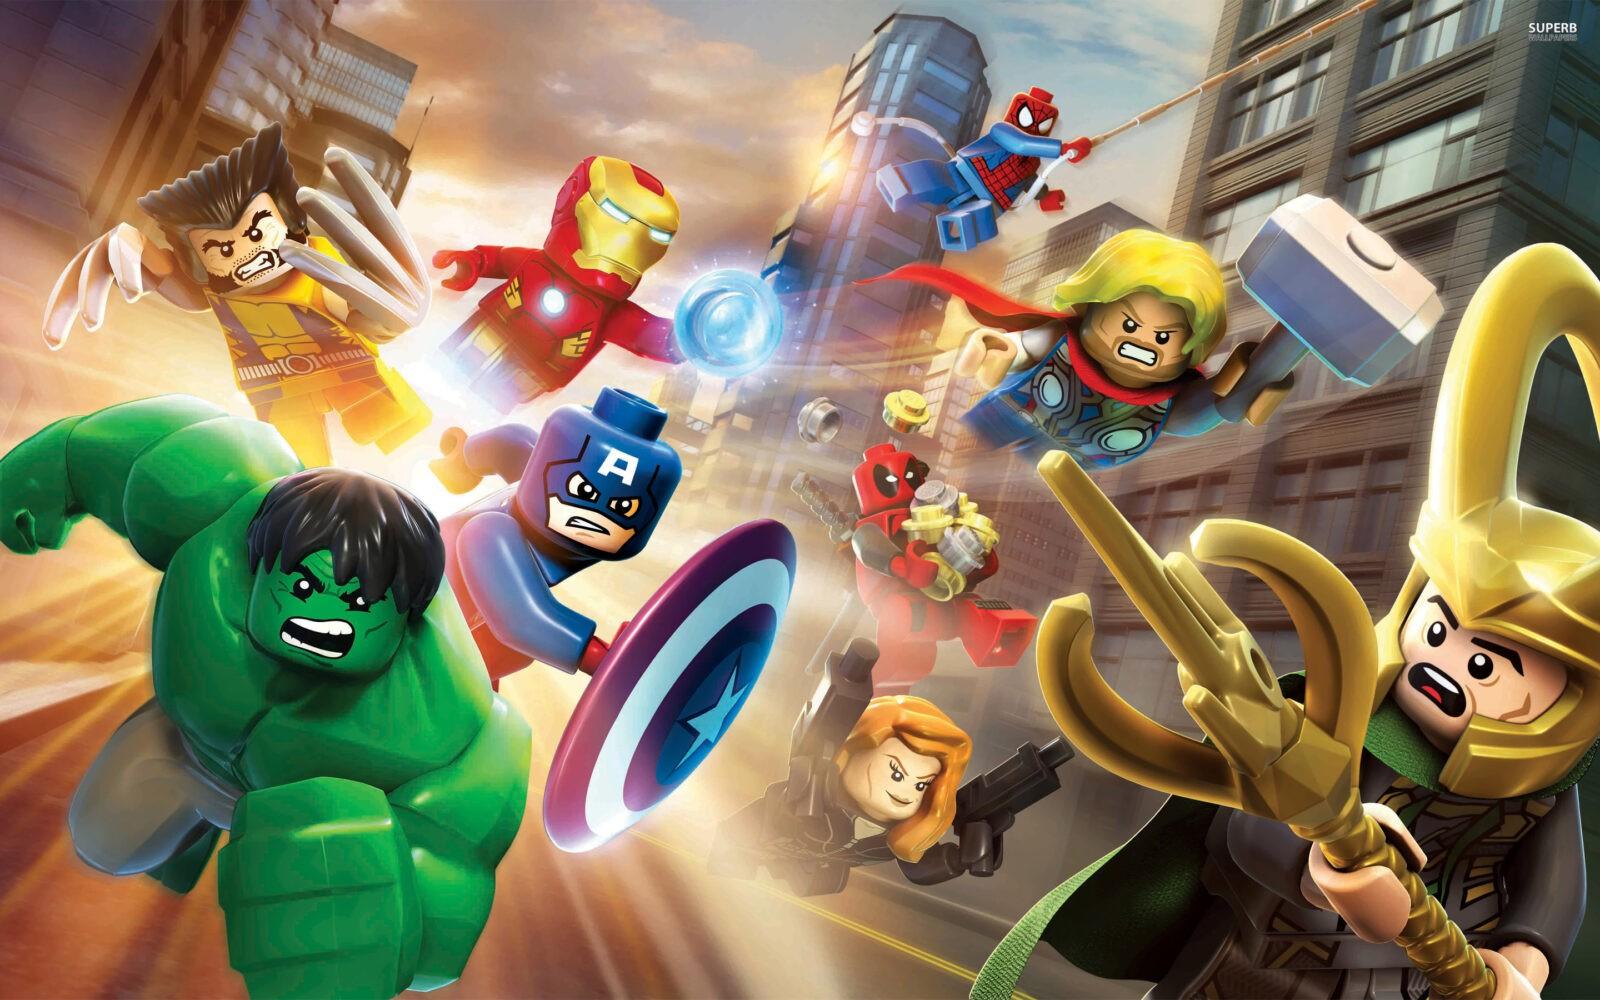 3436993-lego-marvel-super-heroes-21751-2880x1800